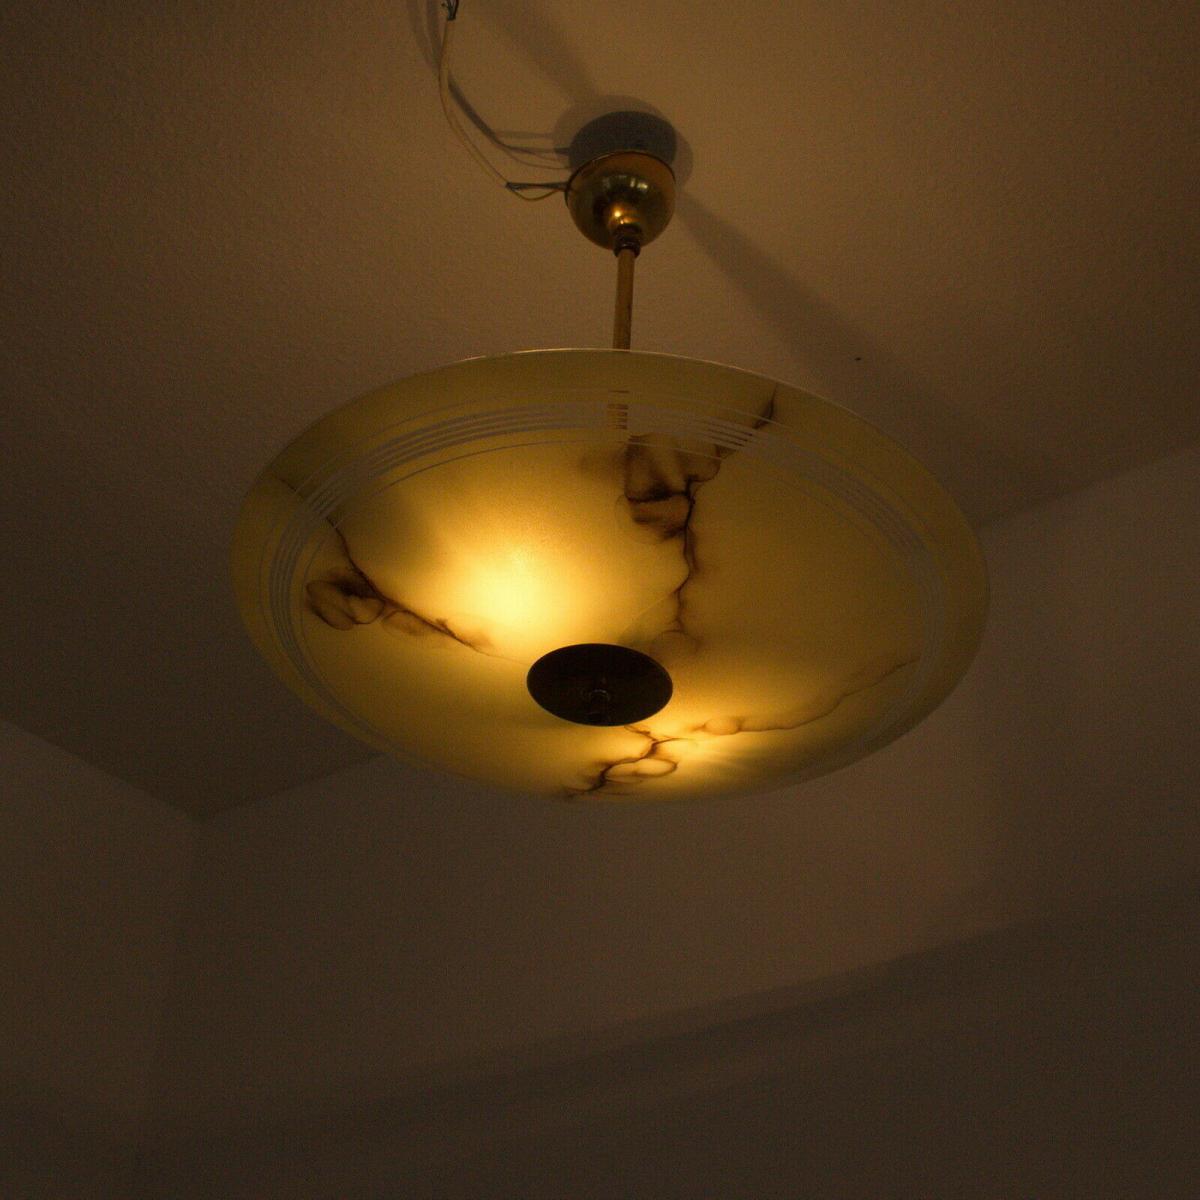 Lampe Schlafzimmer – Caseconrad.com